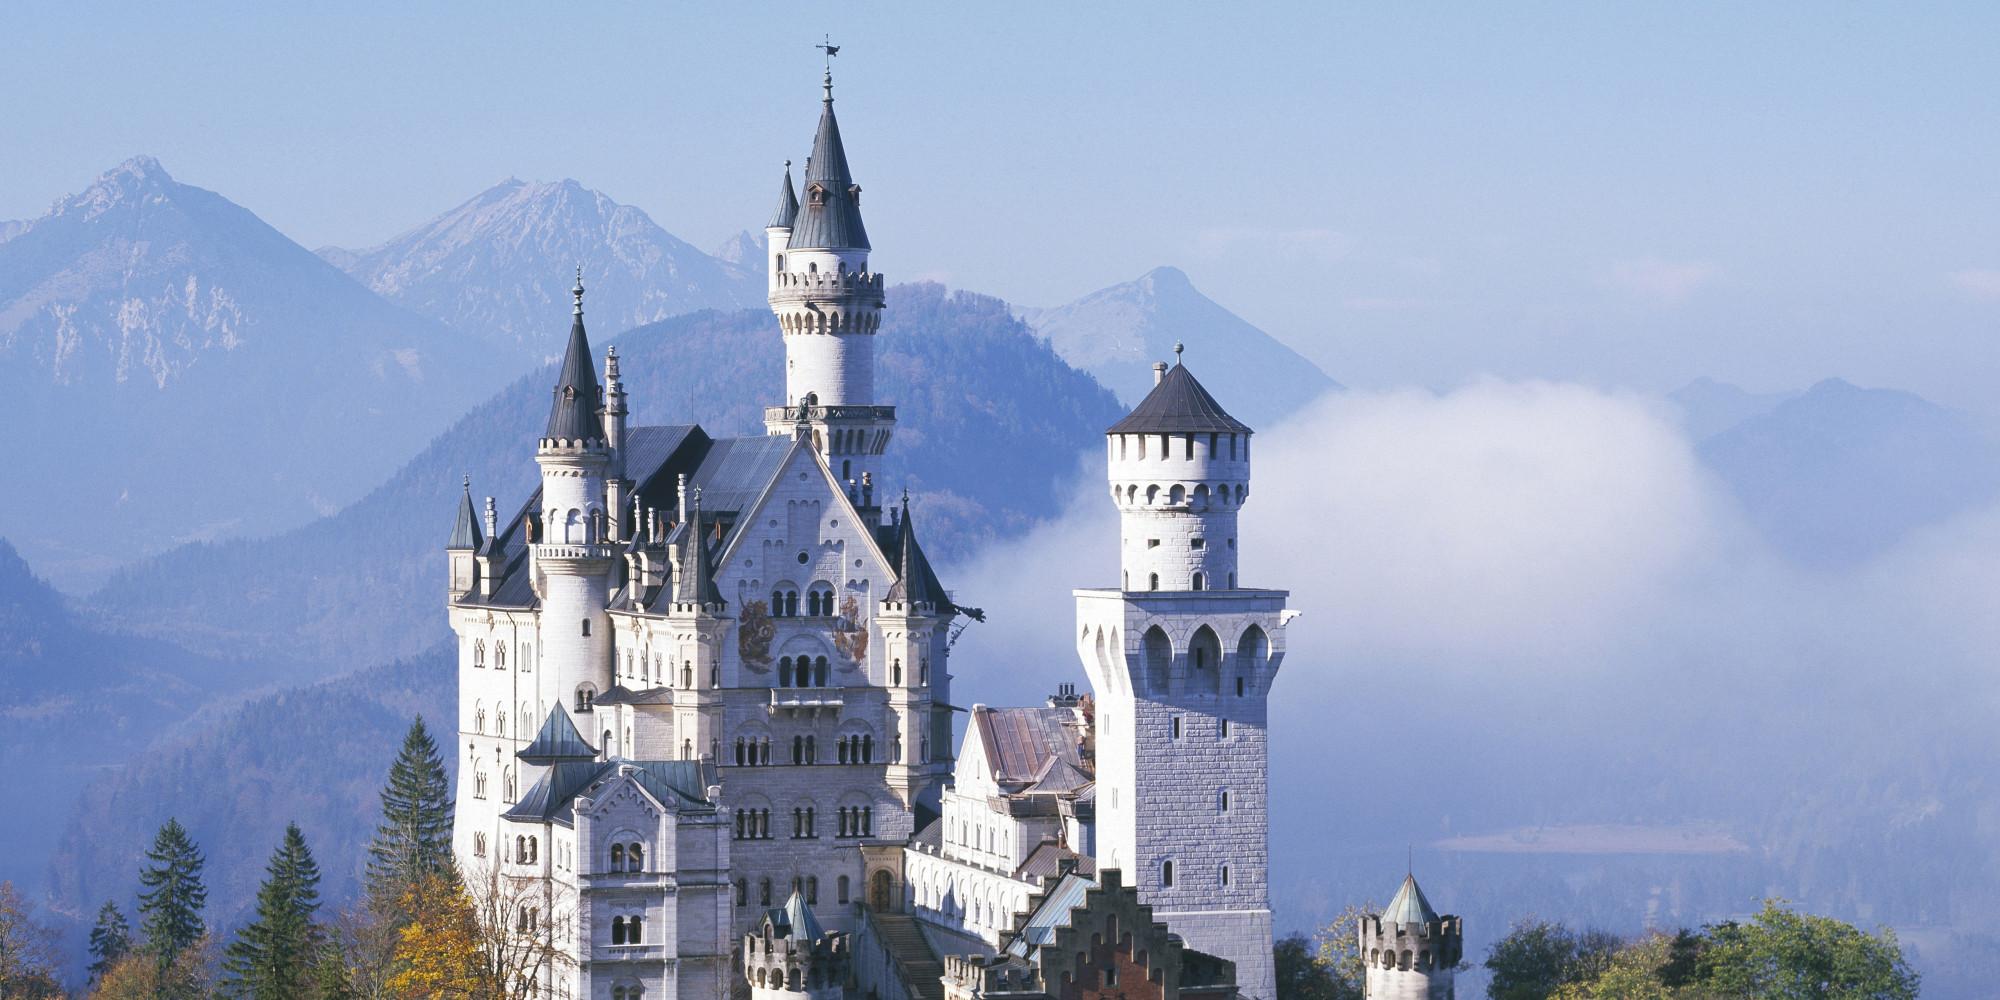 Bavaria 39 s neuschwanstein castle is a fairy tale dream come true - Mobel maxx munchen ...